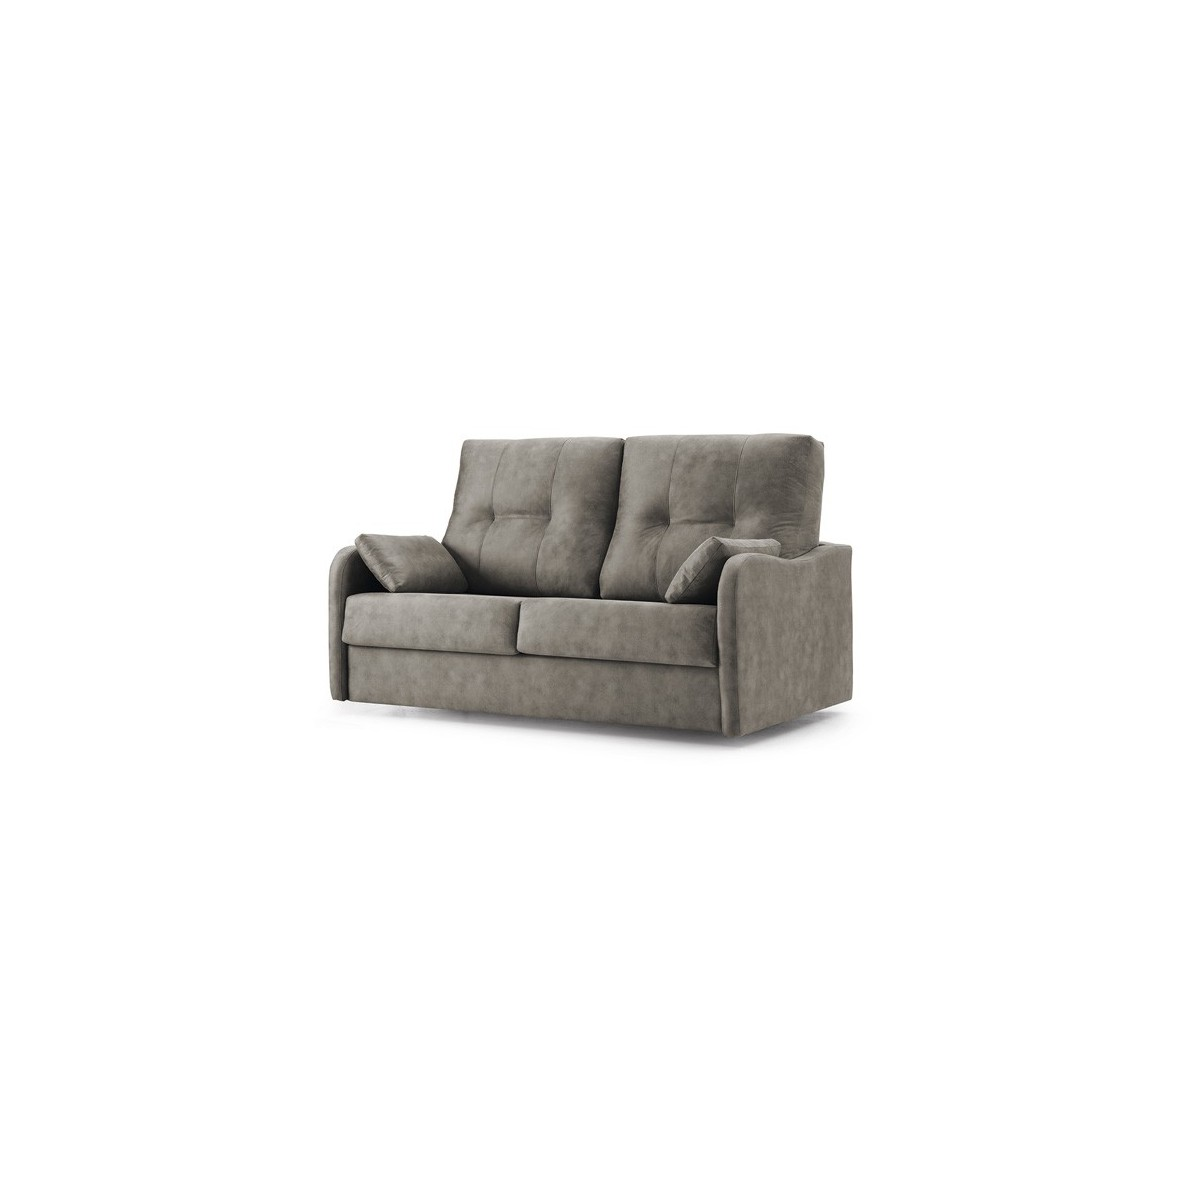 sof cama compacto sistema italiano modelo compact mubeko